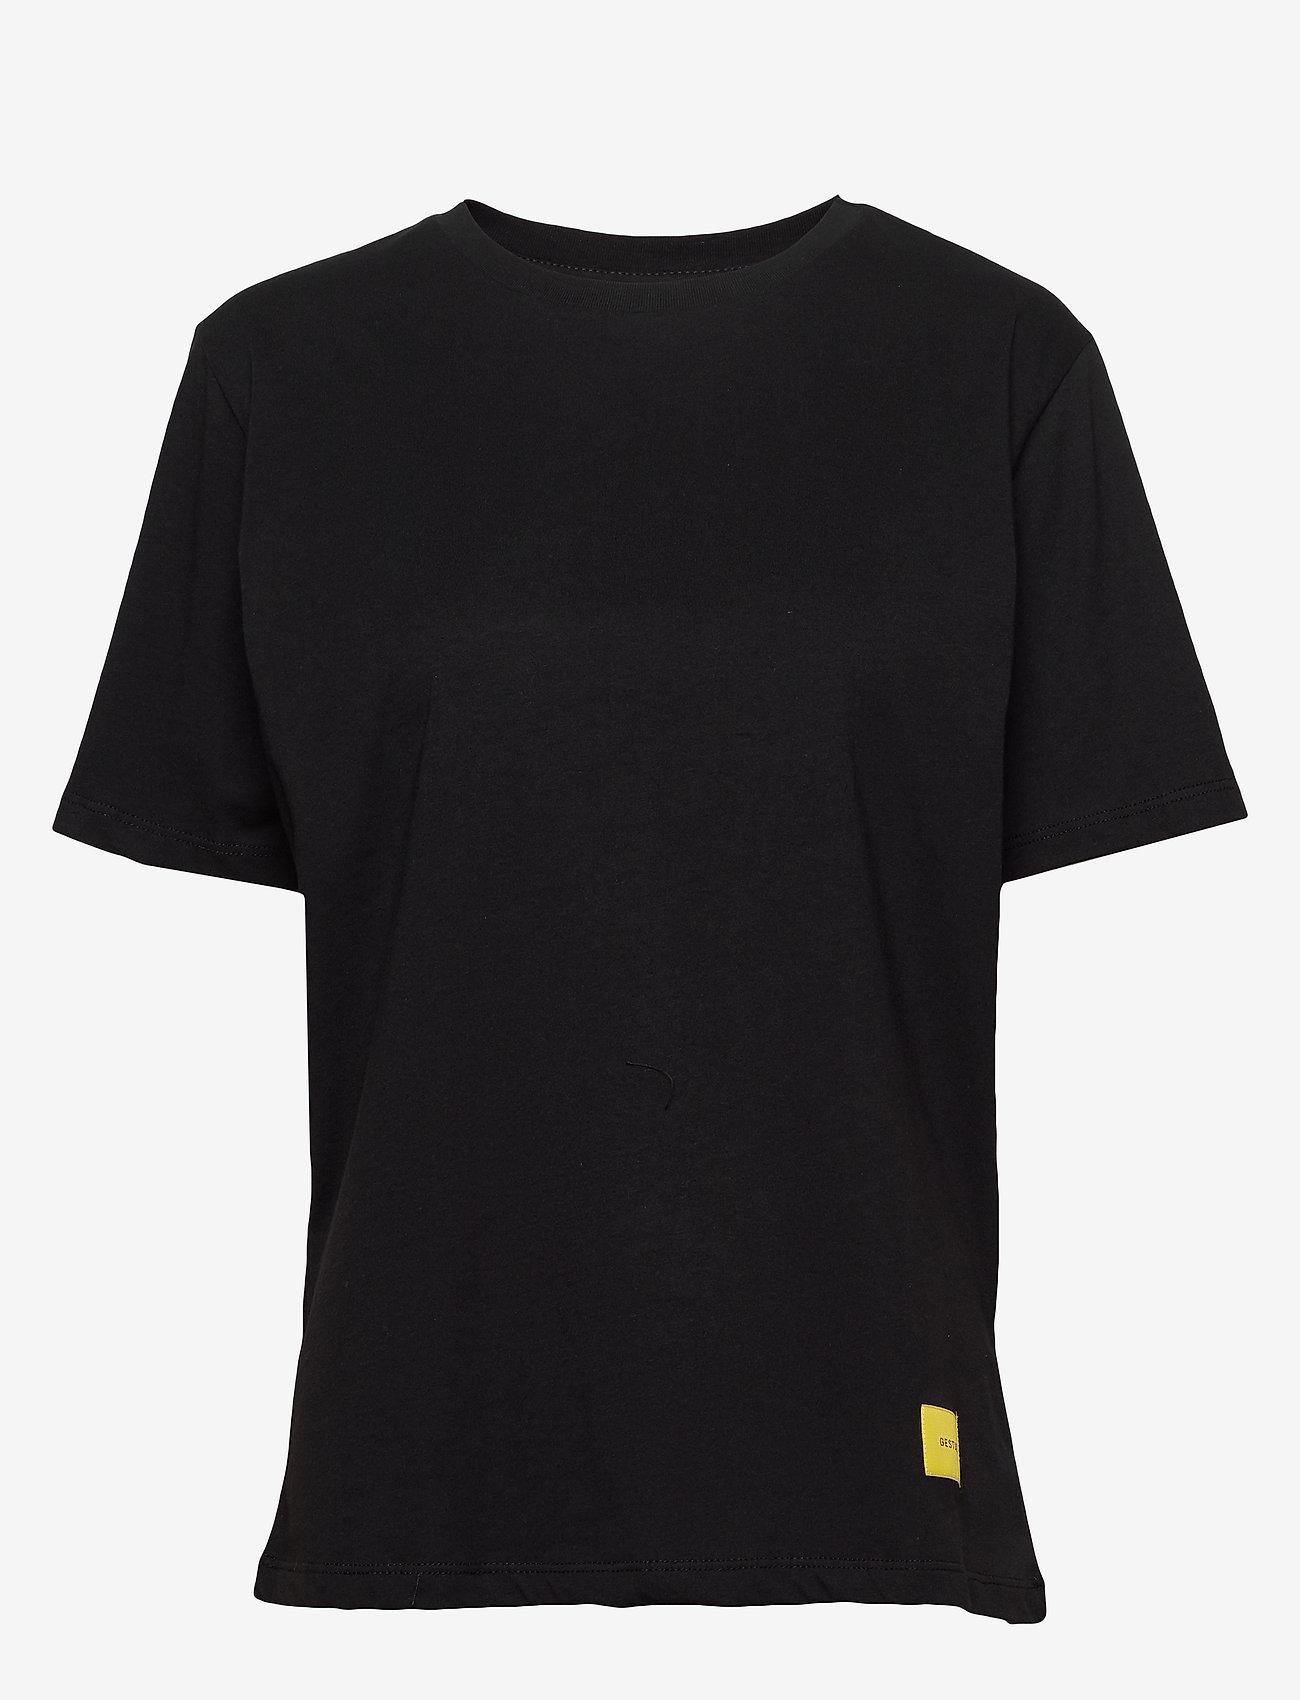 Gestuz - LivGZ tee NOOS - t-shirts - black - 0